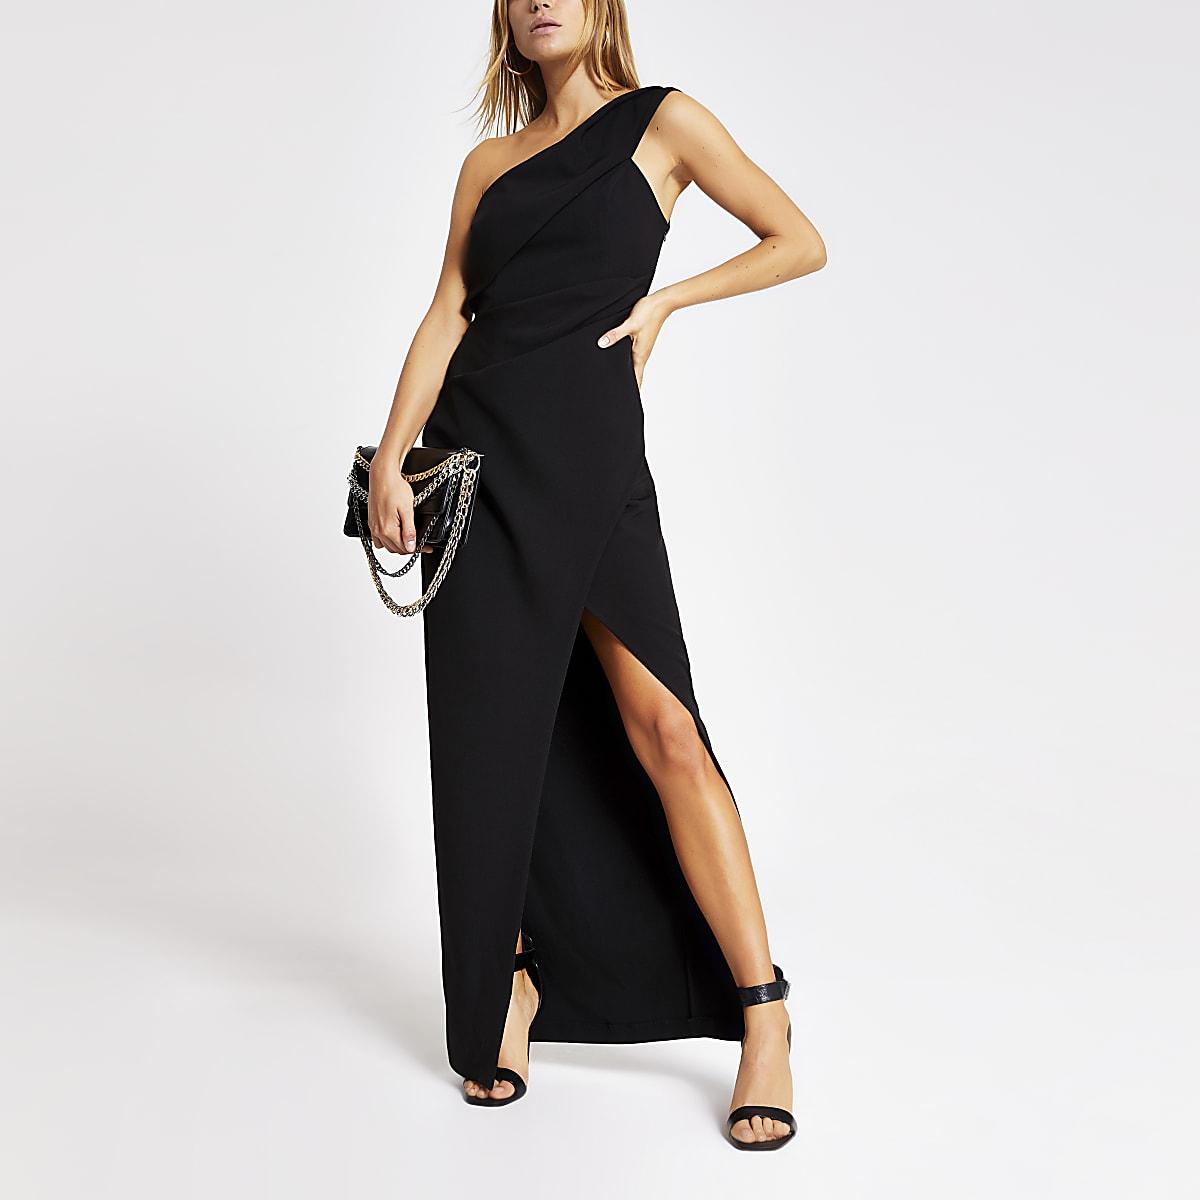 Black one shoulder bodycon maxi dress